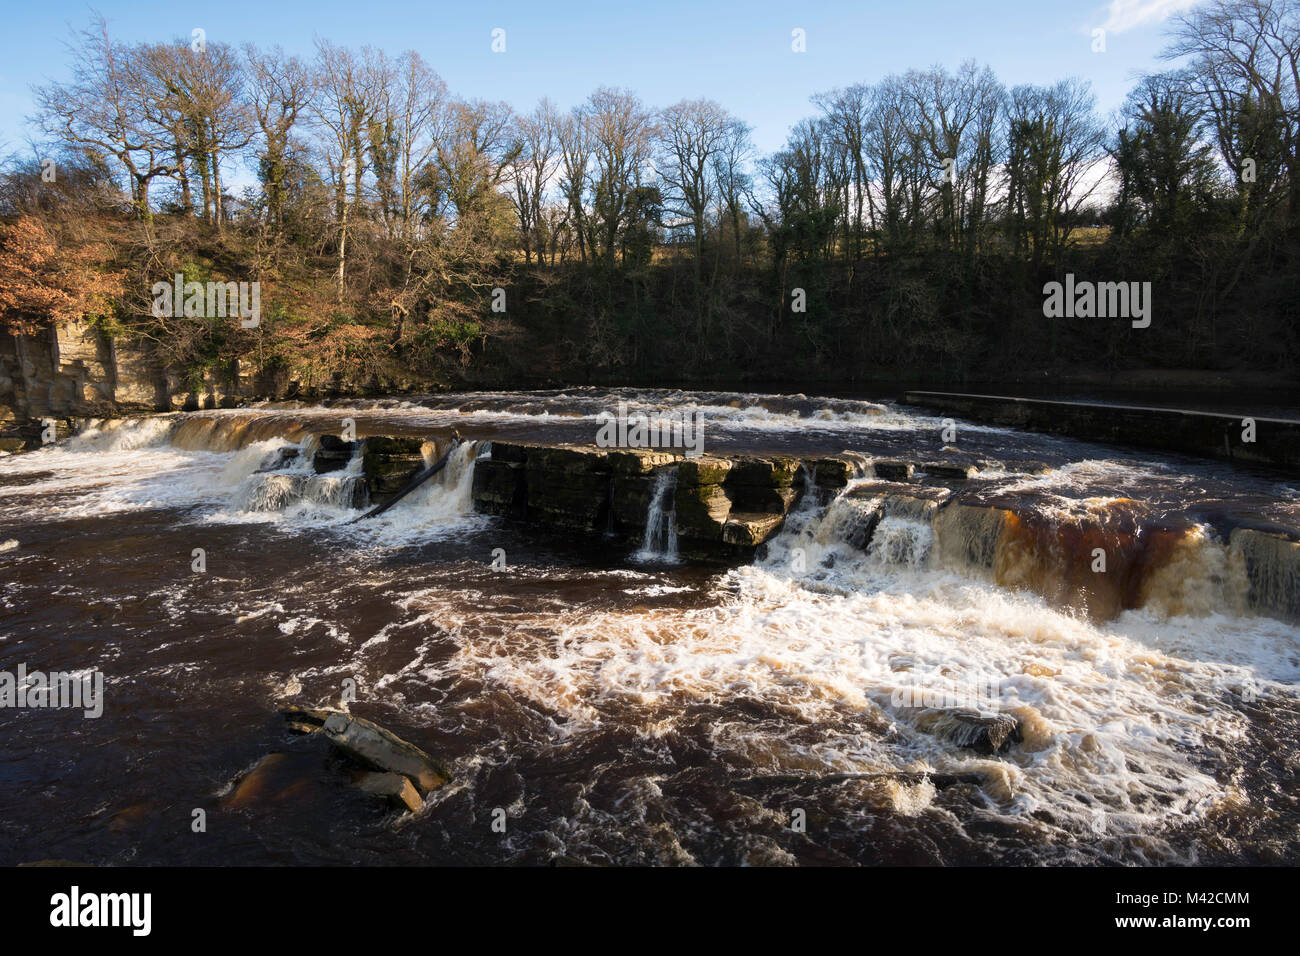 richmond-falls-on-the-river-swale-richmo